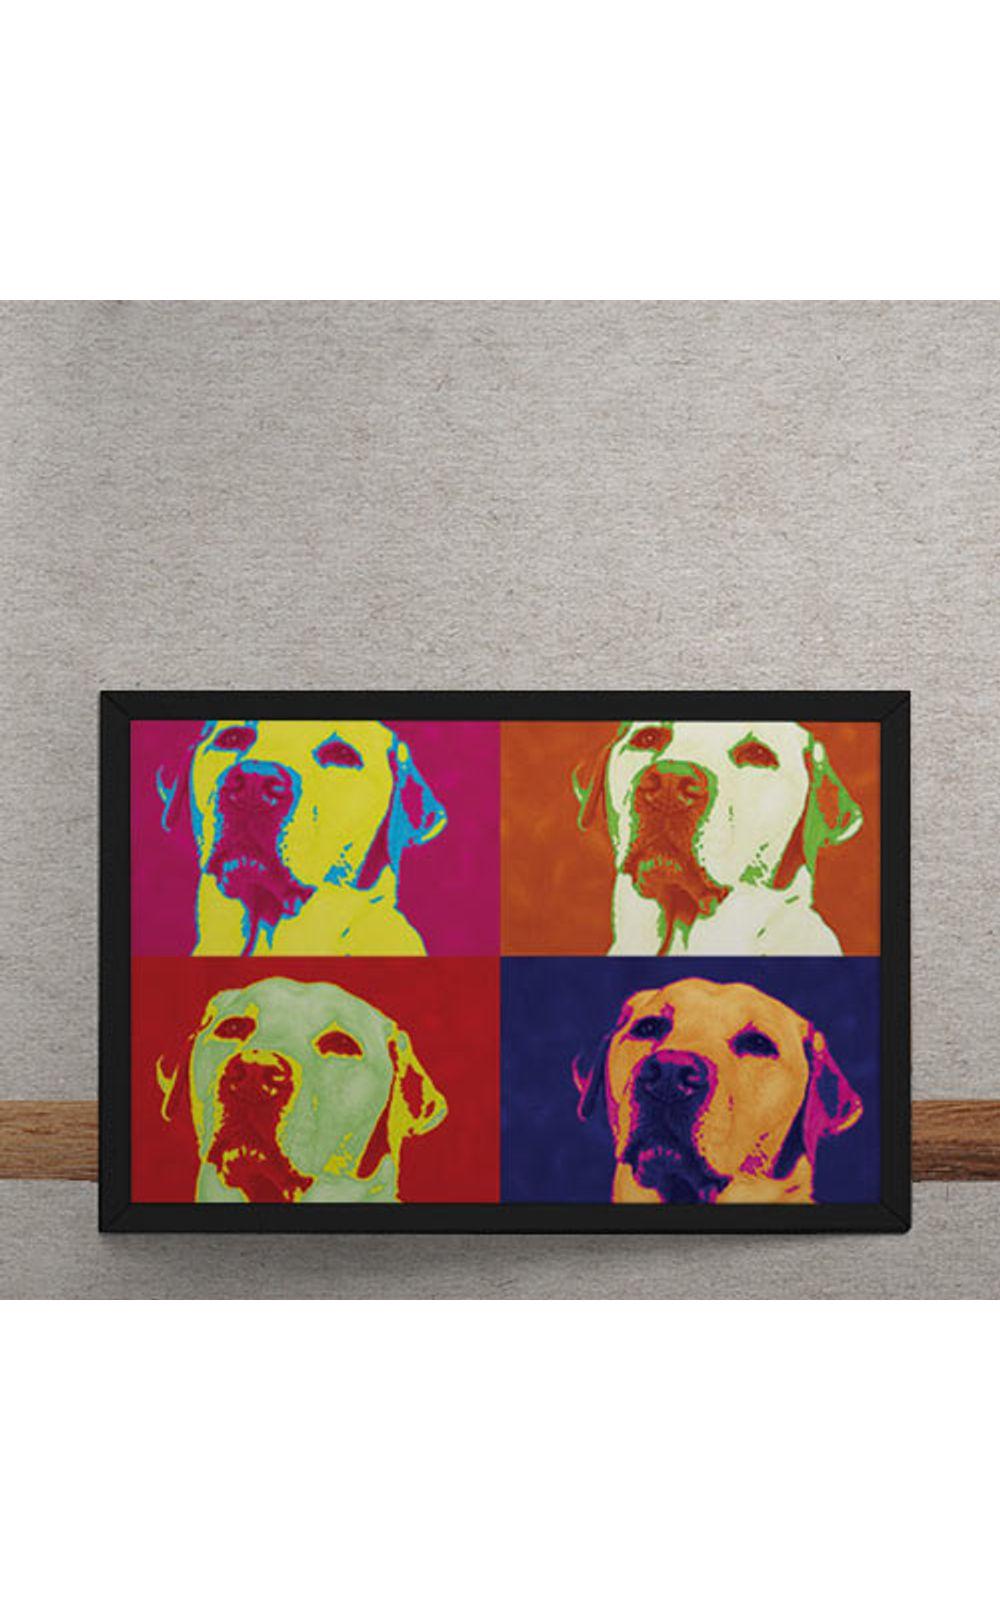 Foto 3 - Quadro Decorativo Andy Warhol Pop Art Cachorro Labrador